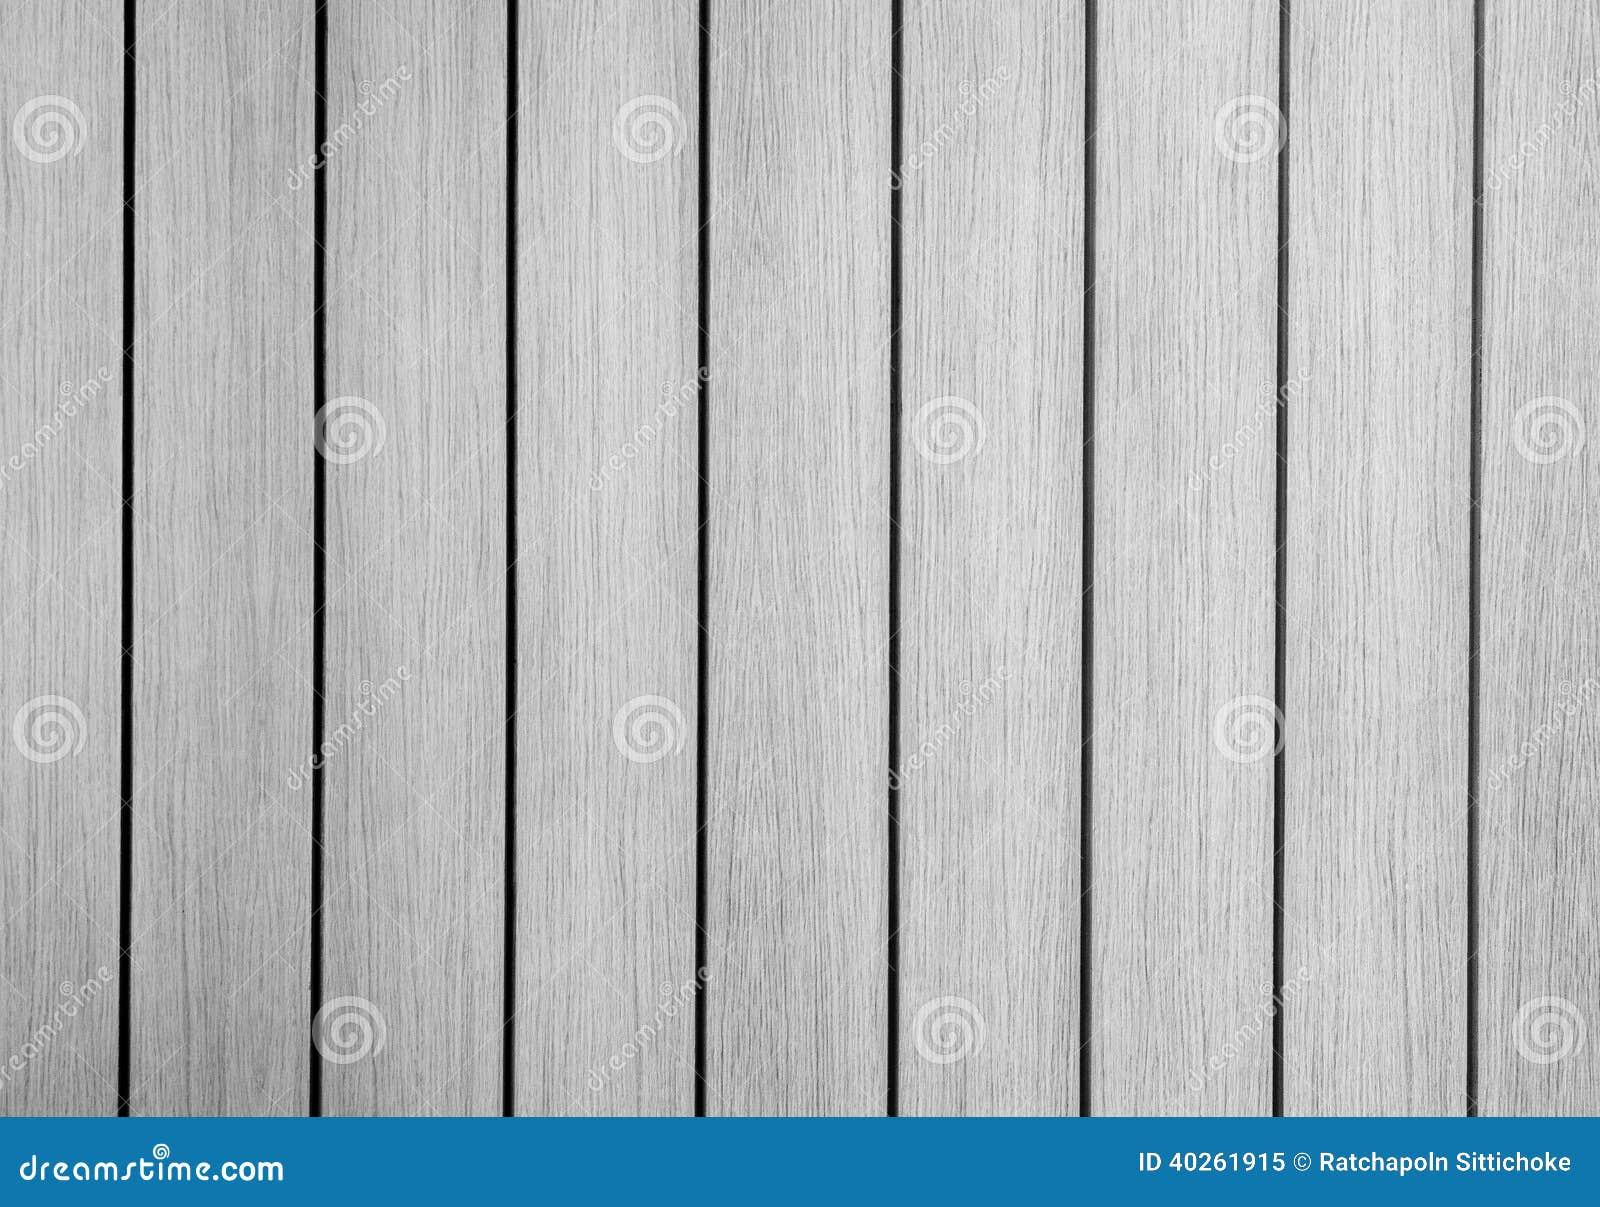 Papel pintado de madera gris foto de archivo imagen for Papel pintado para madera